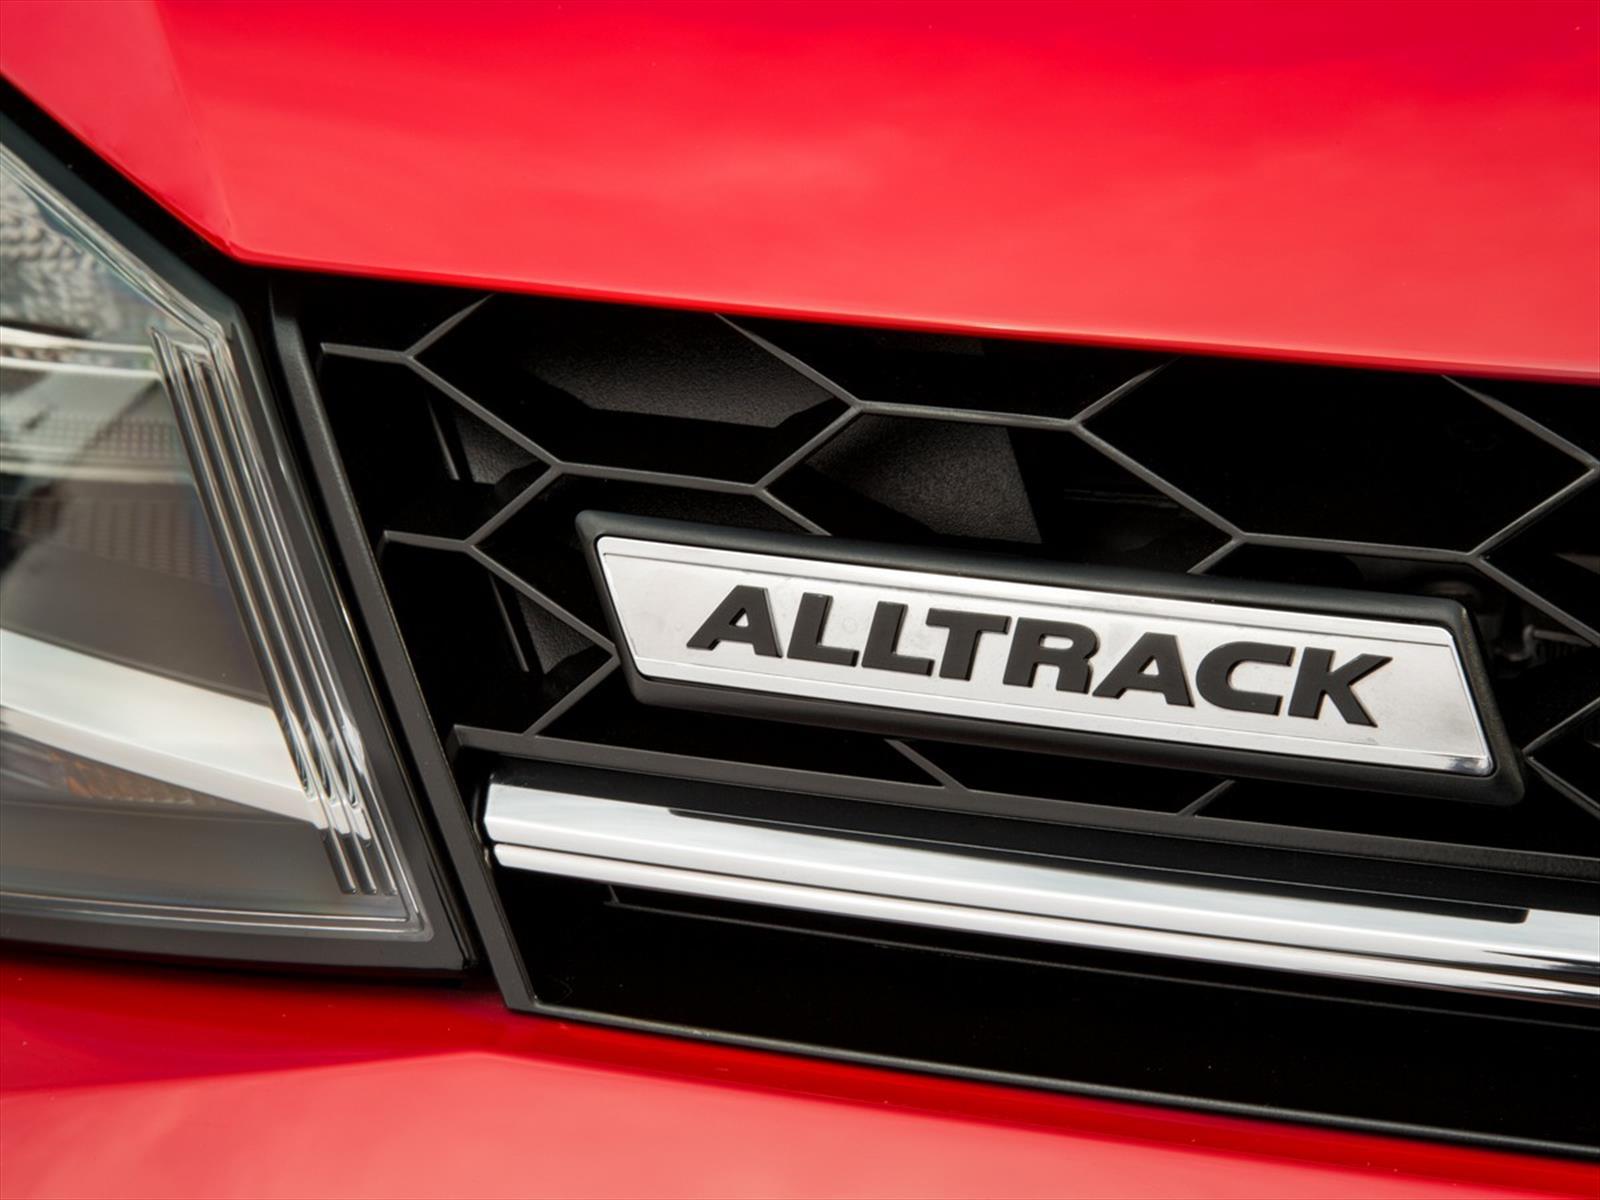 Volkswagen Golf Alltrack nombrado Canadian Car of the Year 2017 - Autocosmos.com